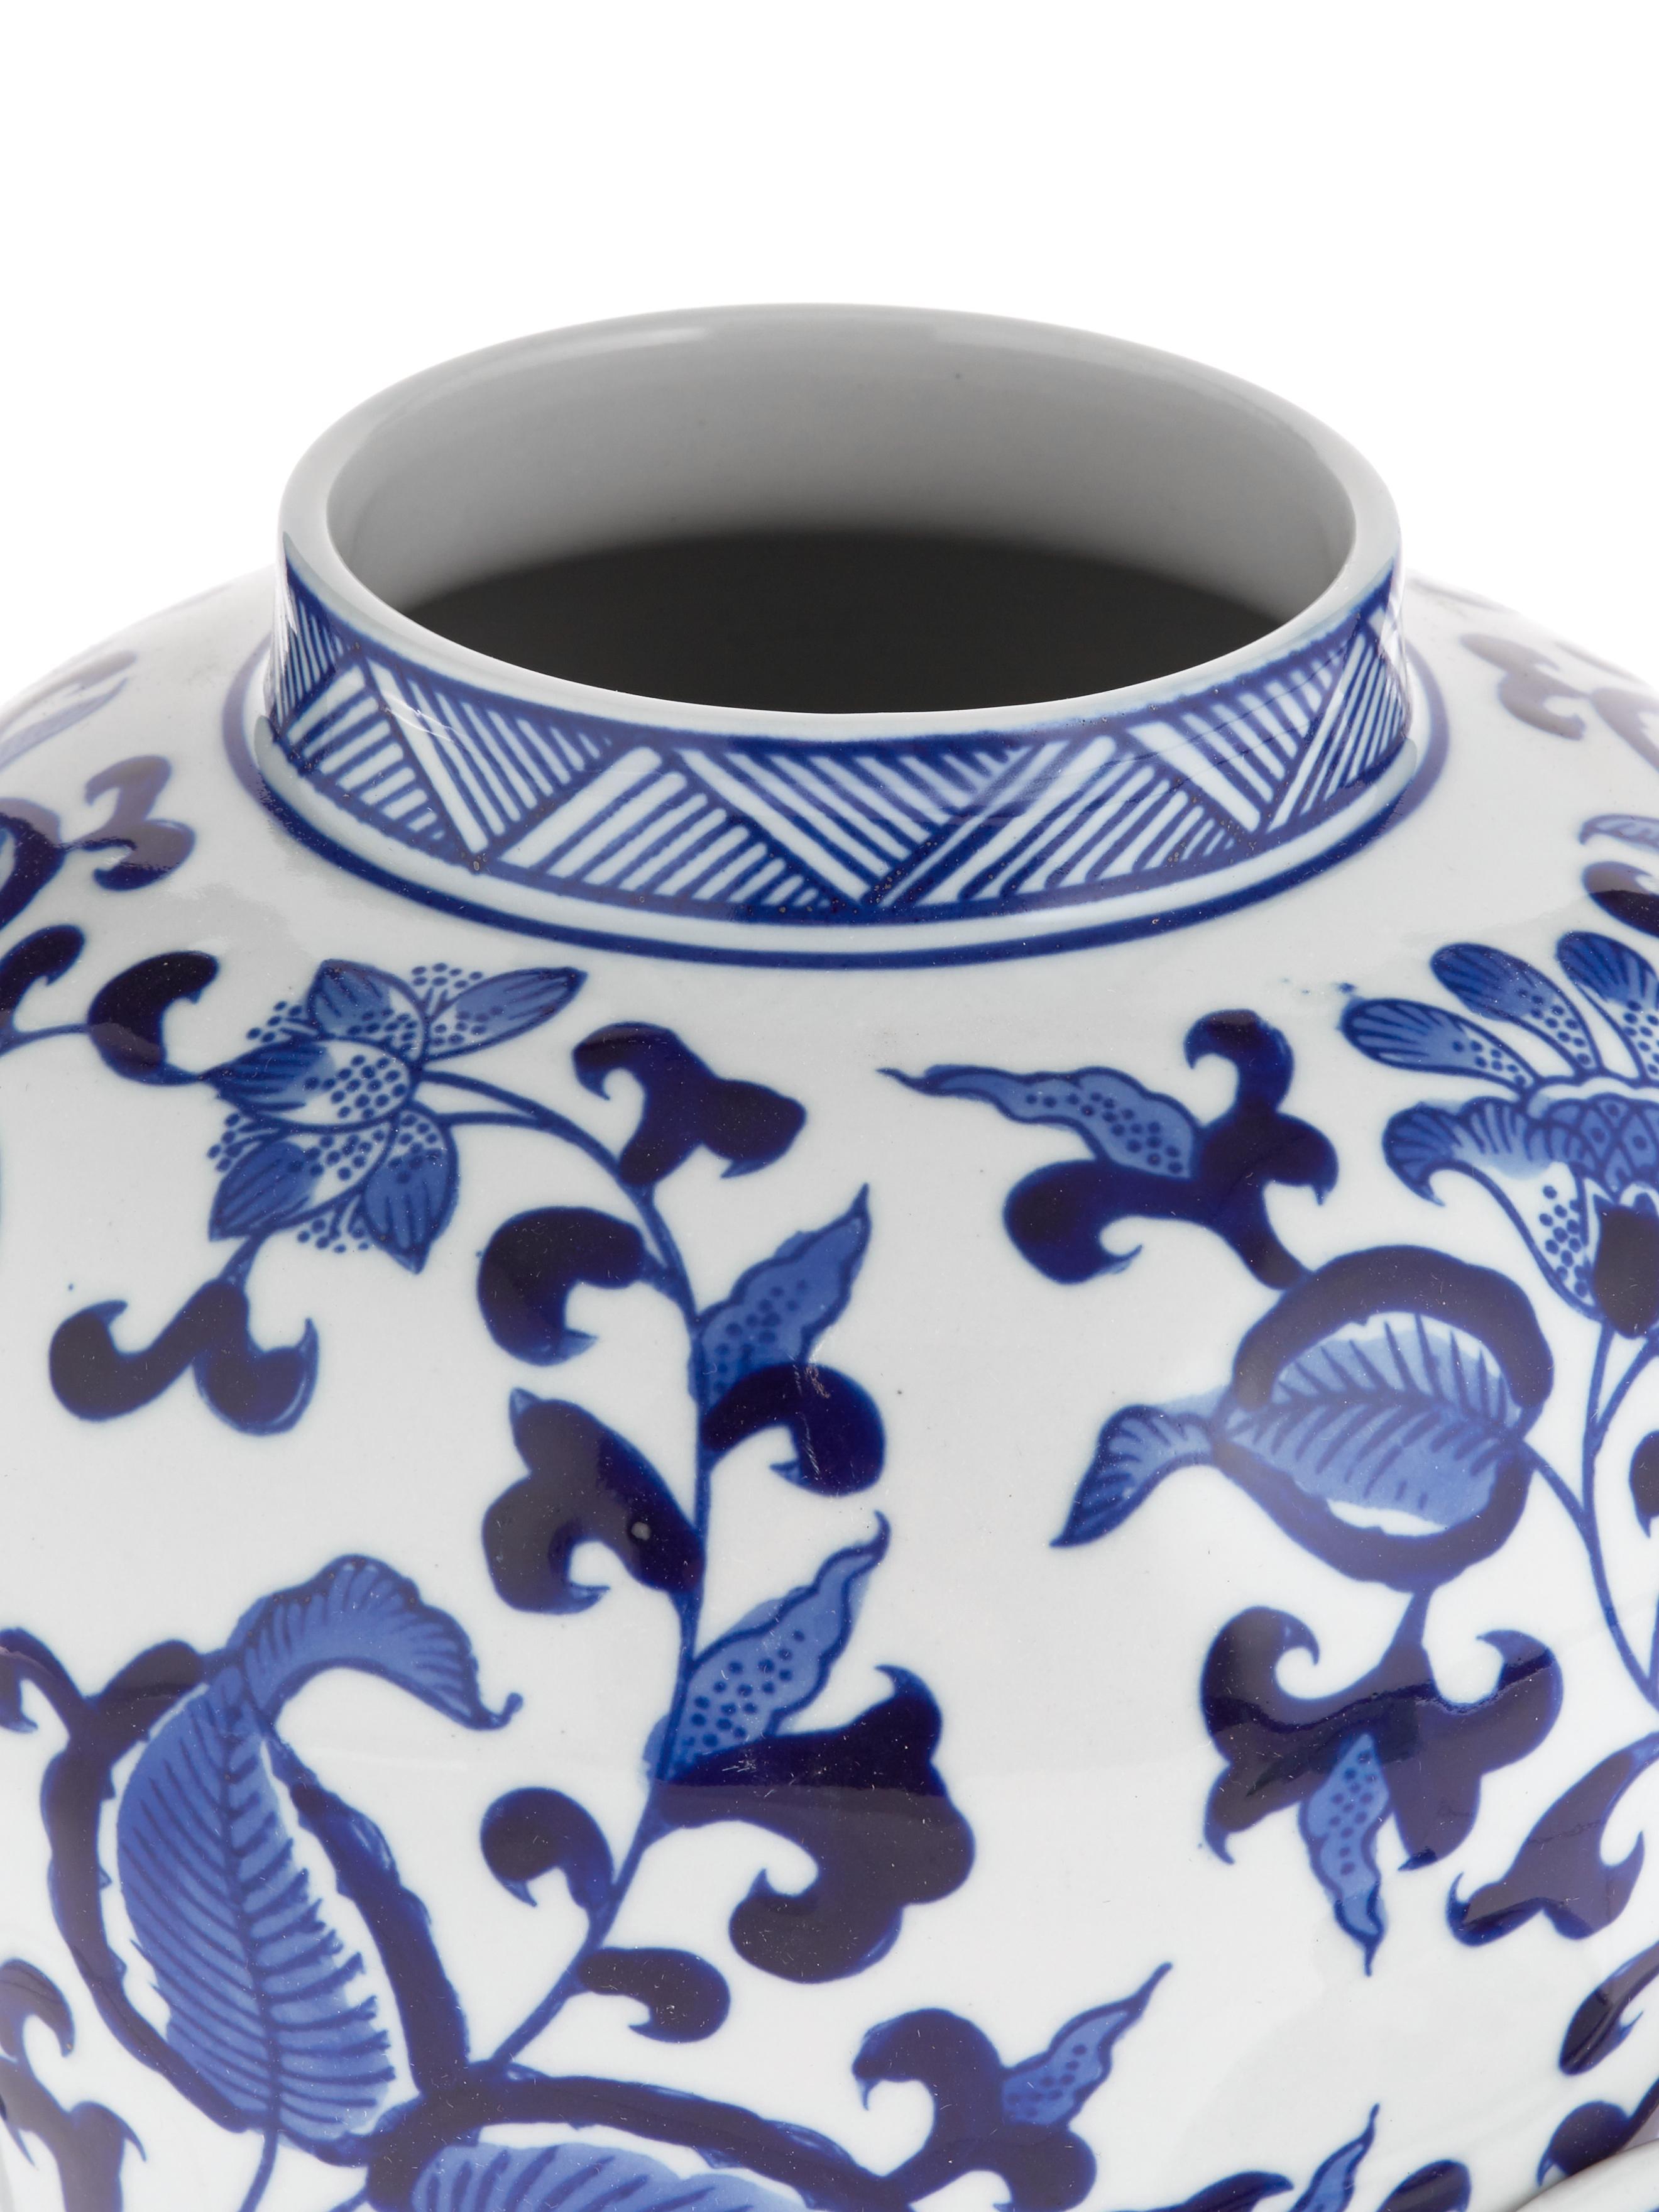 Vaas met deksel Annabelle uit porselein, Porselein, Blauw, wit, Ø 16 cm